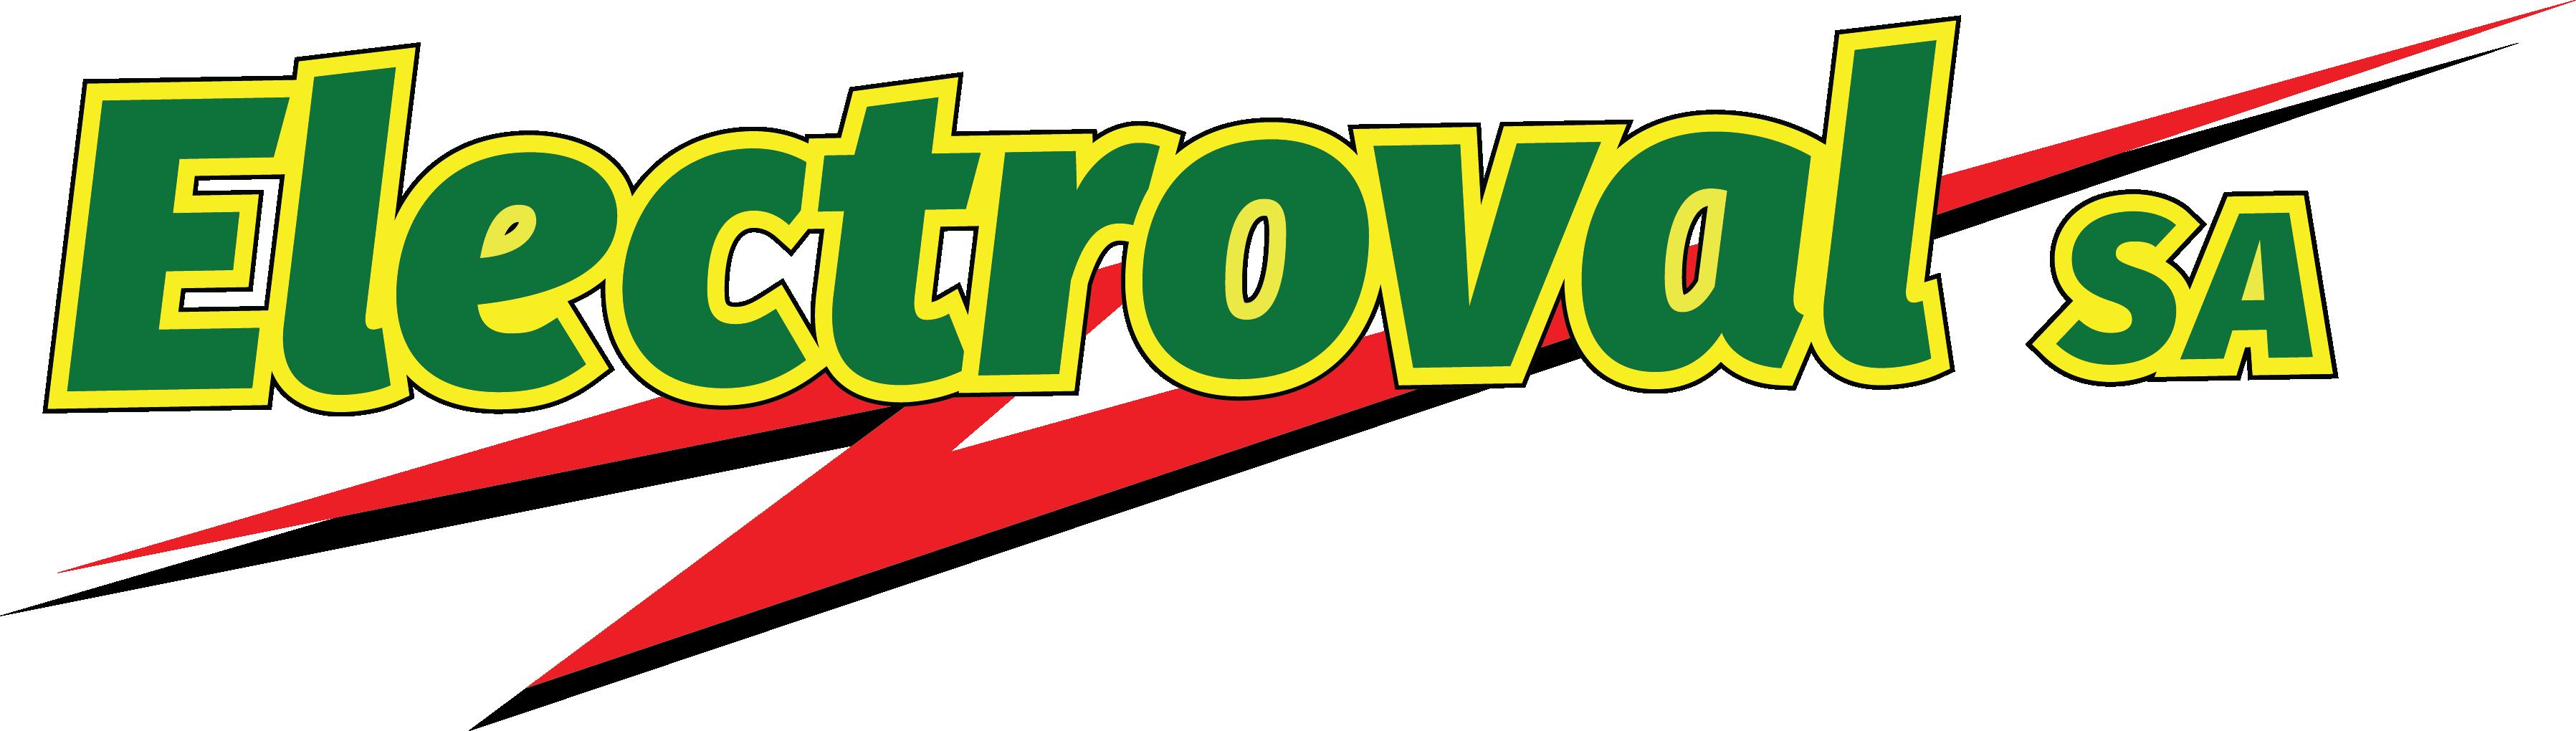 Electroval SA